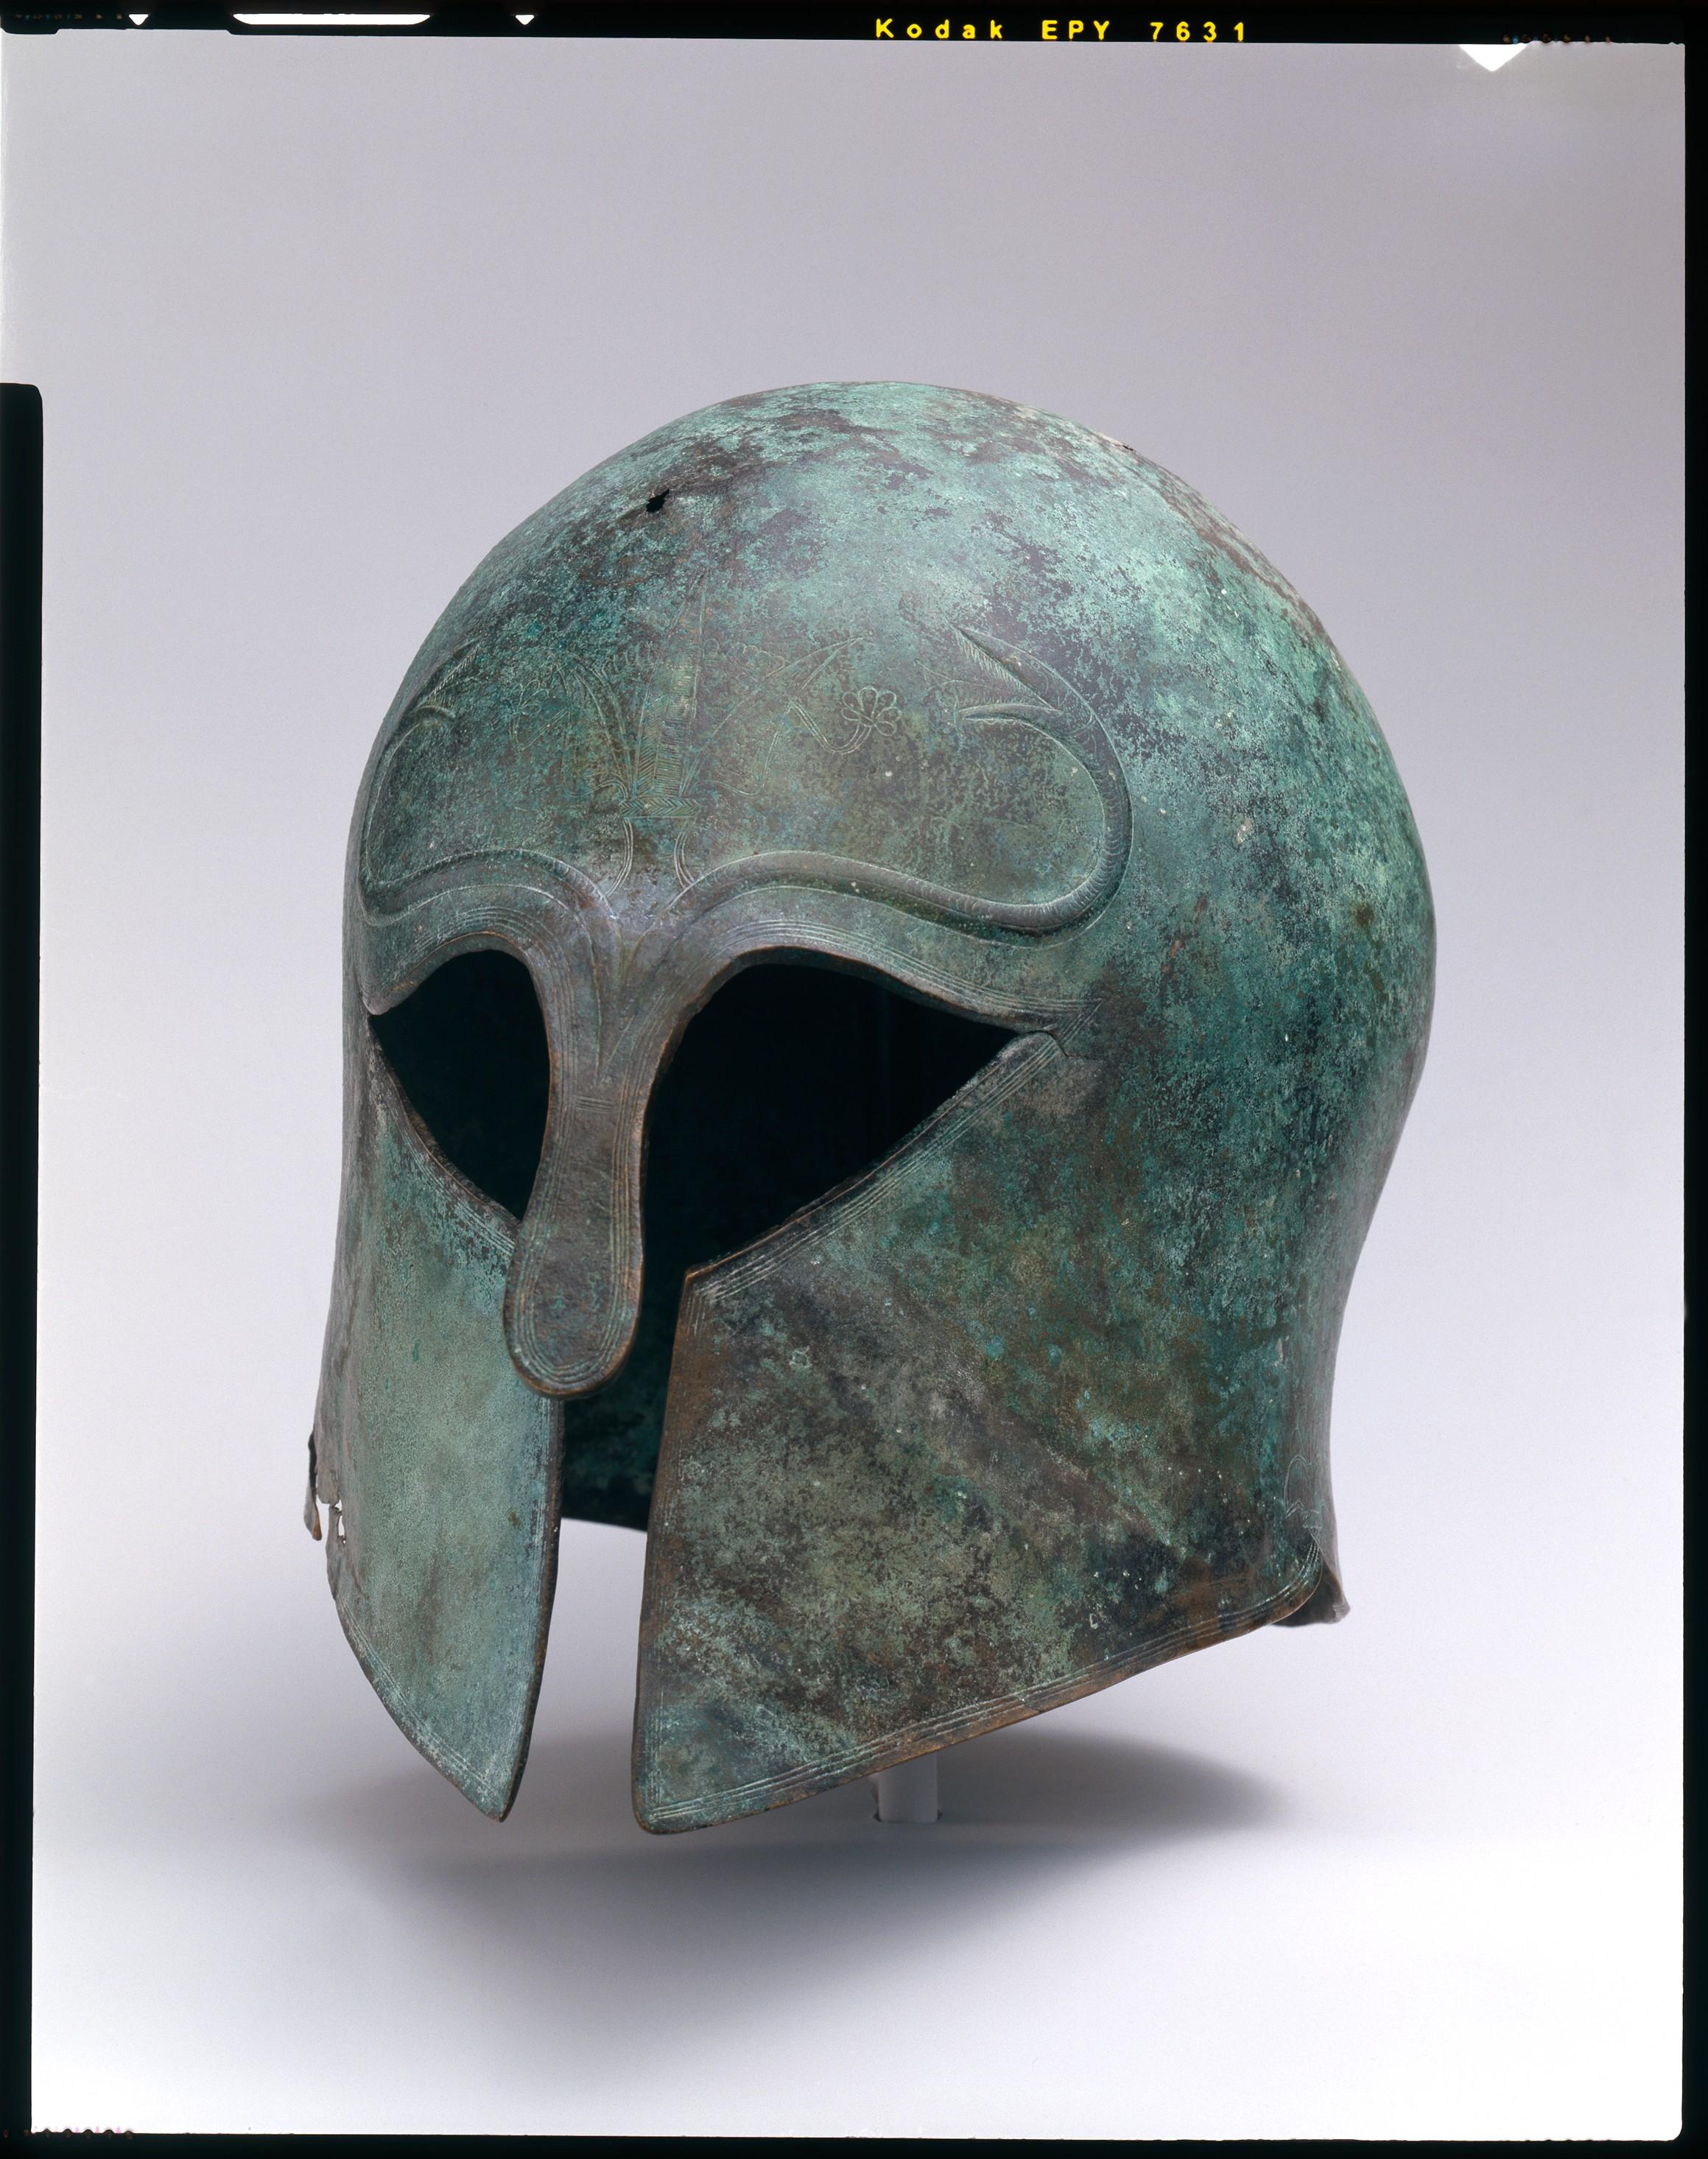 600-575 BC Century Bronze Corinthian Helmet - Metropolitan Museum